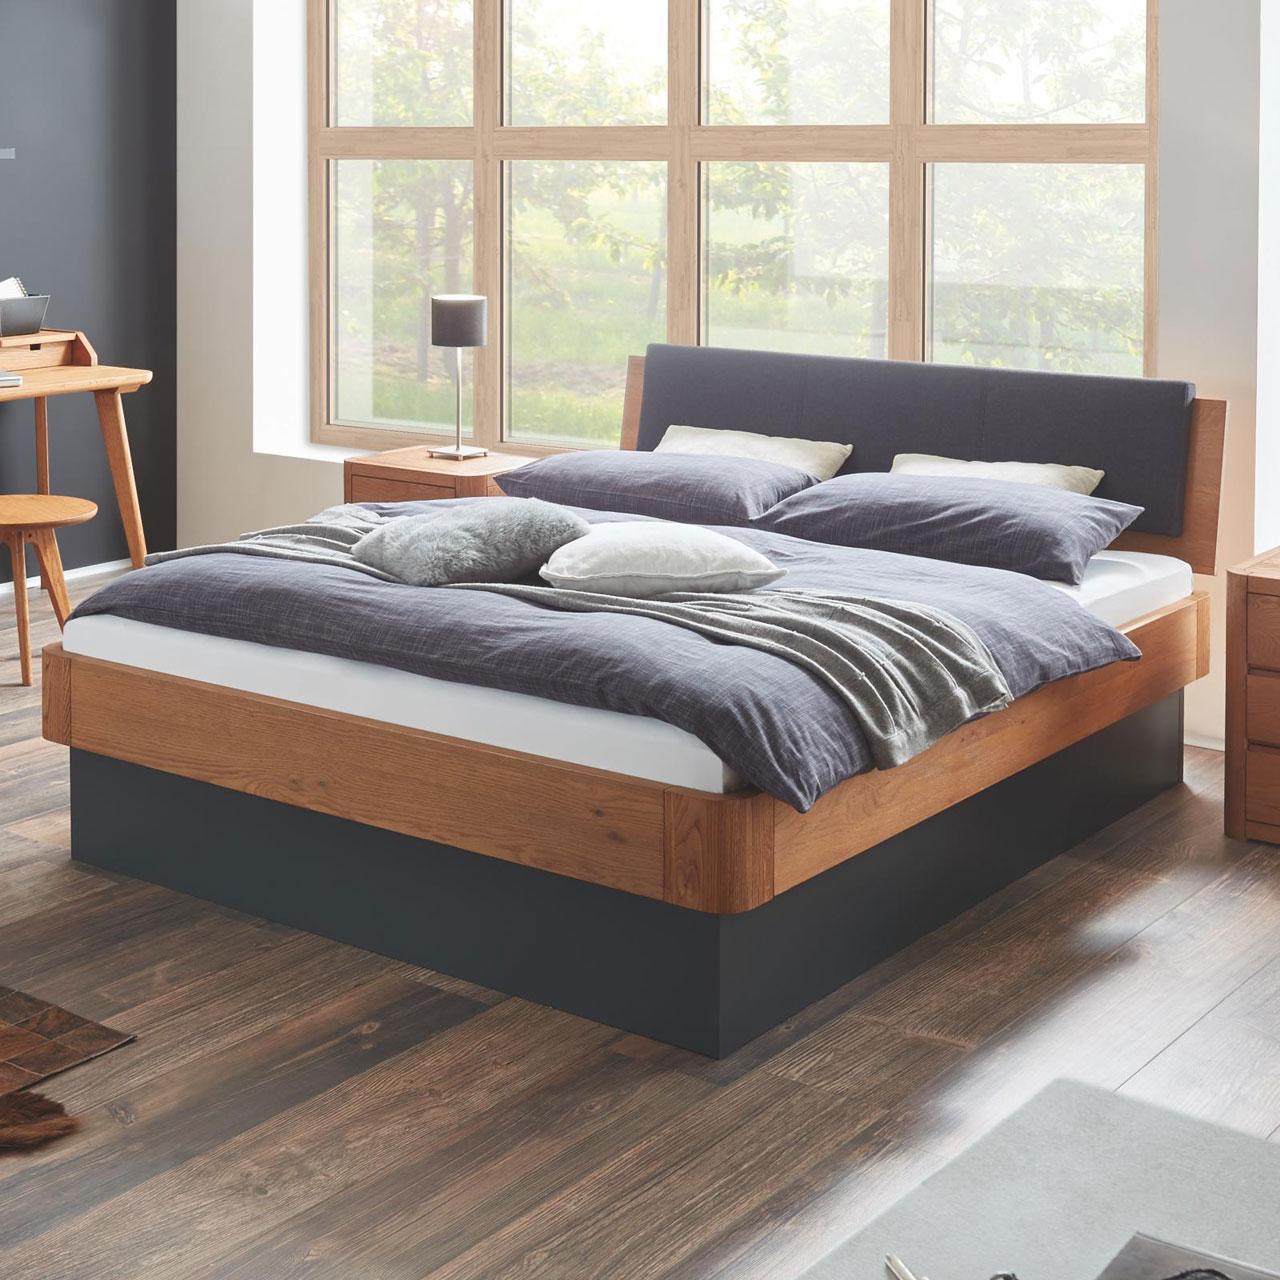 hasena oak line massivholzbett varus ravo pratico ron. Black Bedroom Furniture Sets. Home Design Ideas